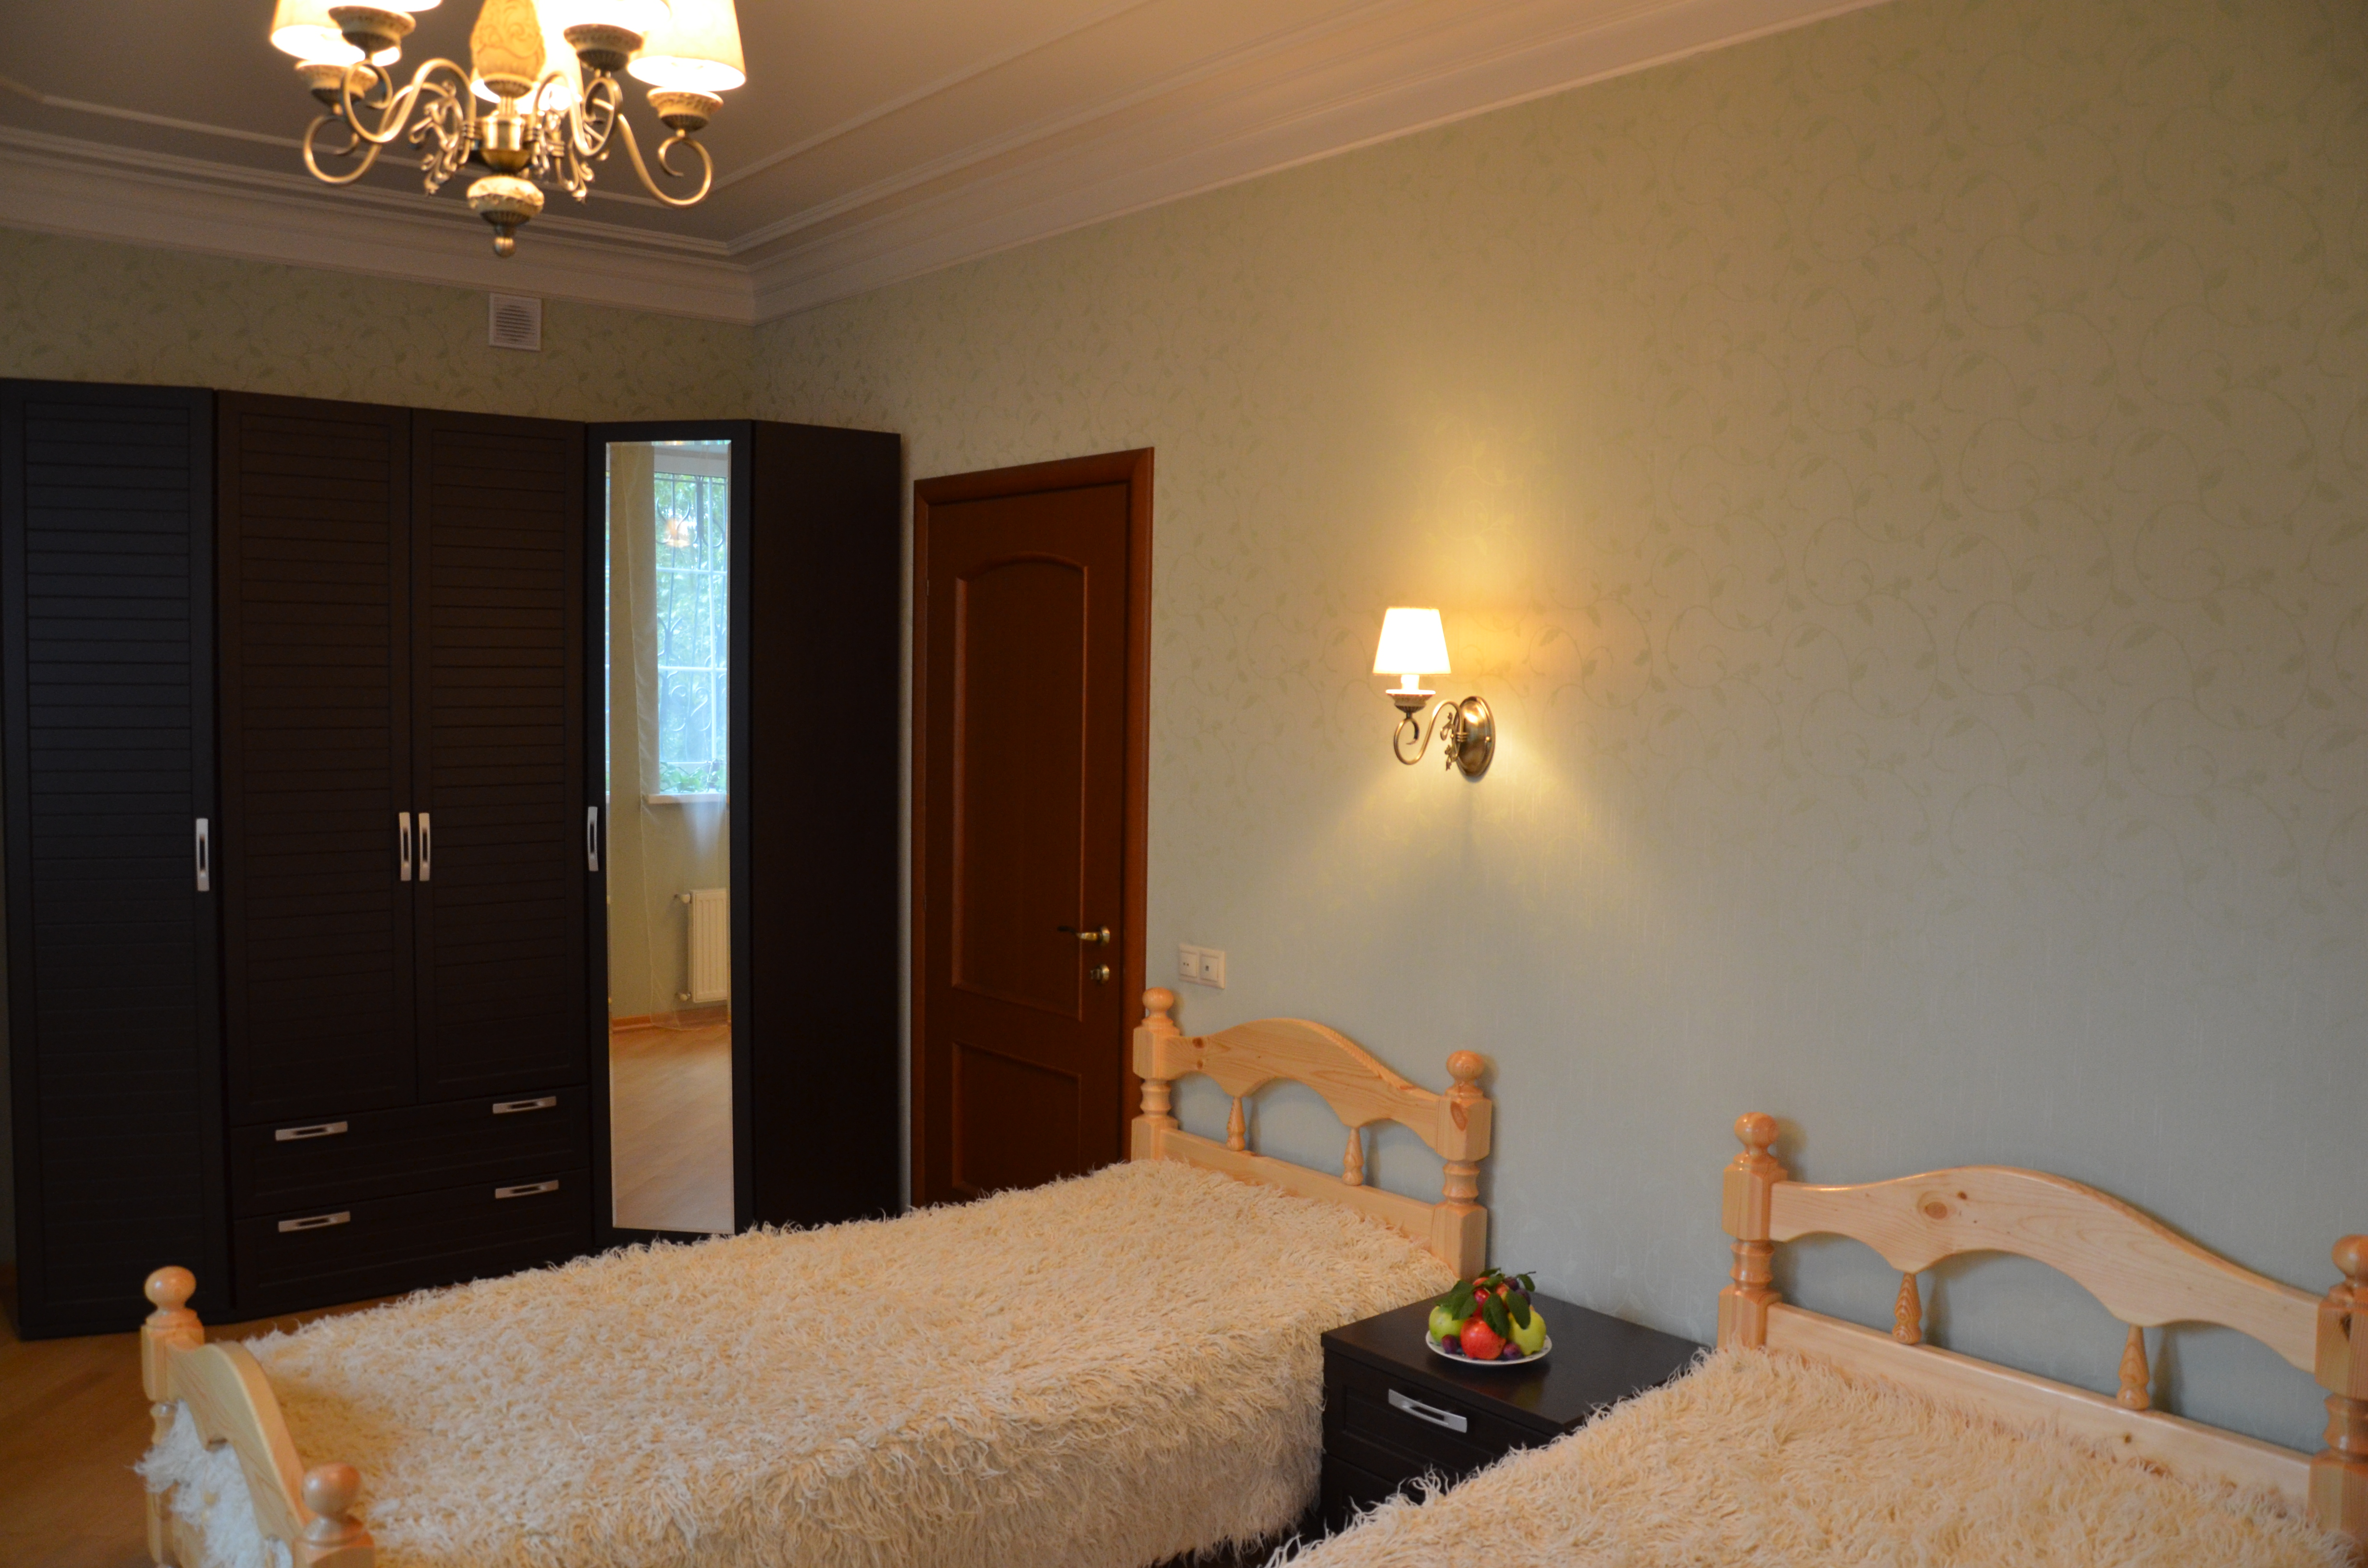 Двухместная комната 17 кв.м.